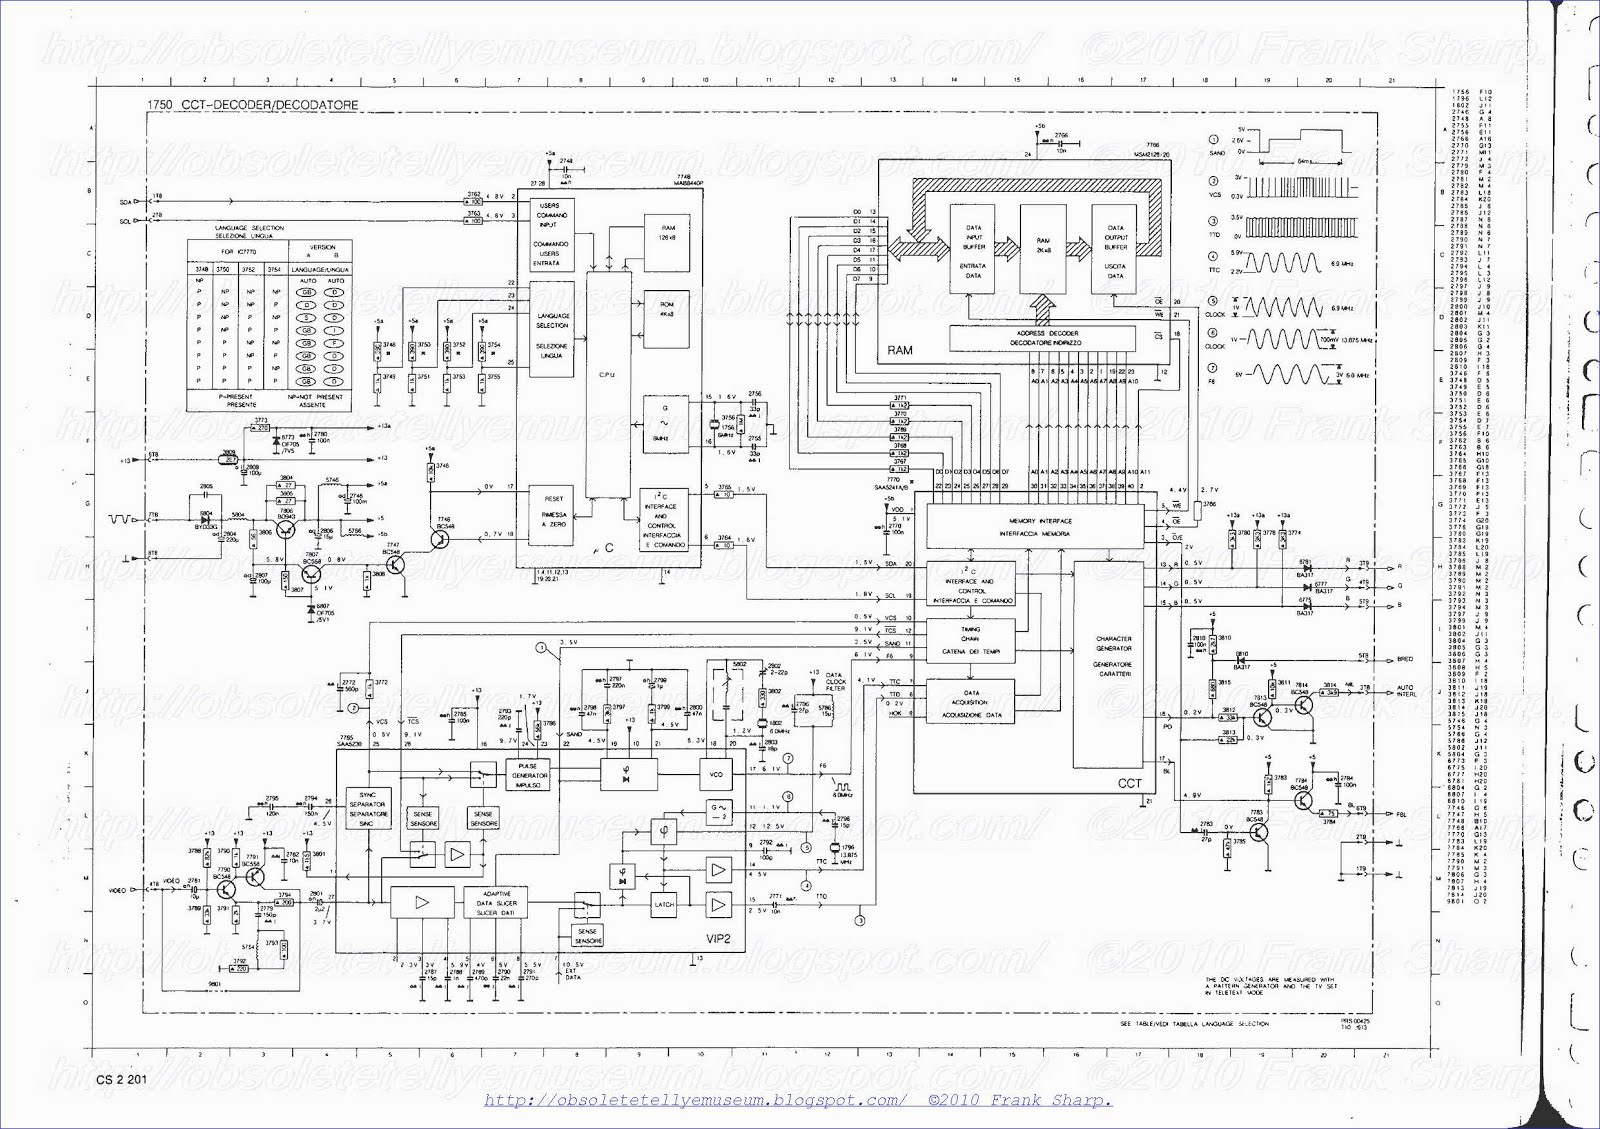 Obsolete Technology Tellye !: PHILIPS 26CE2281 RUBENS